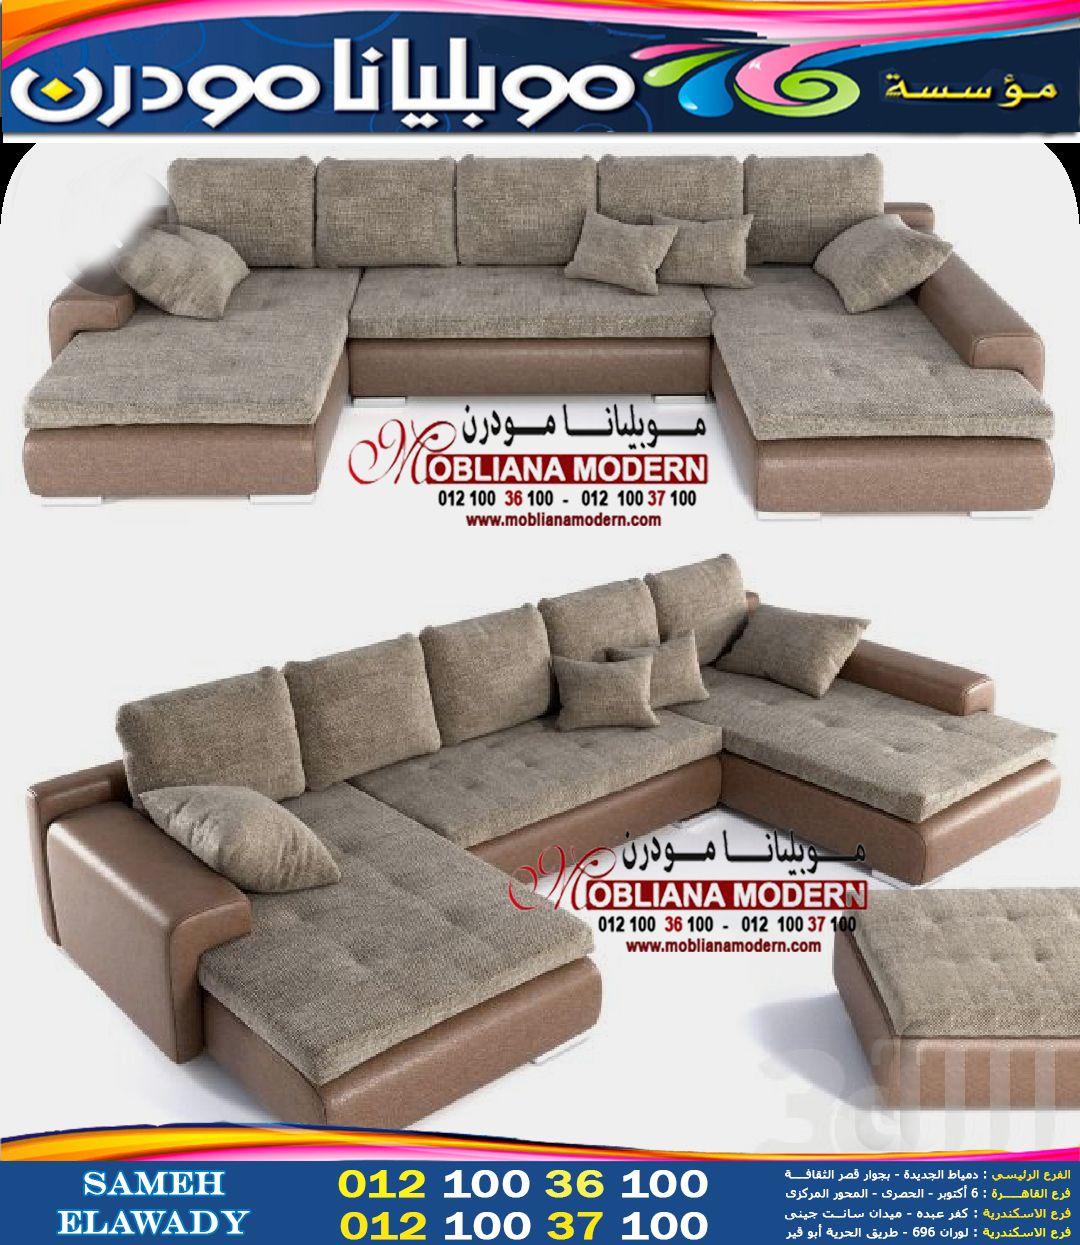 صور ركنات 2023 احدث تصميم ركن مودرن Sectional Couch Couch Living Room